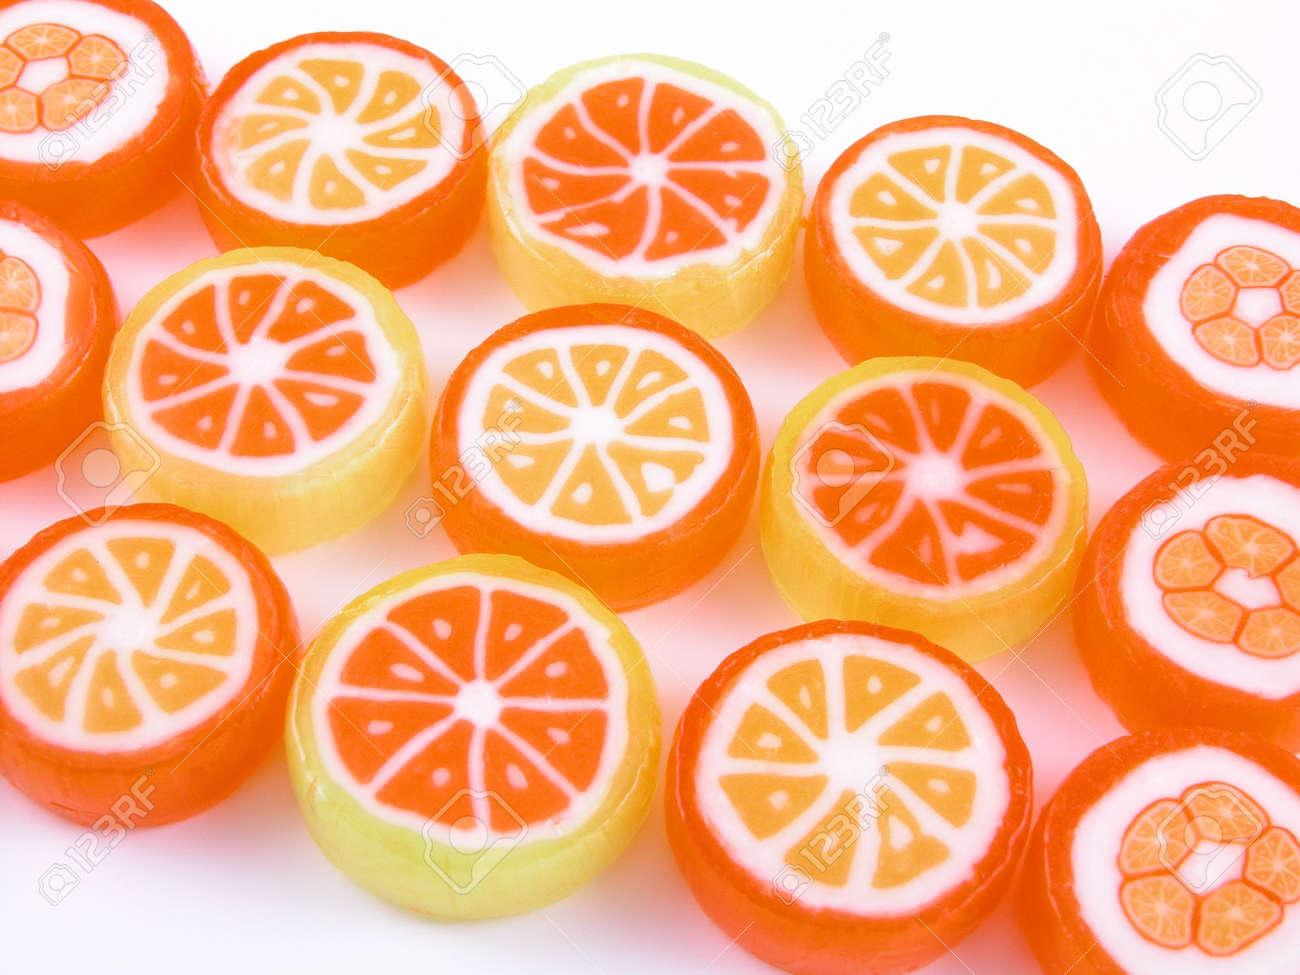 sweet candy background on white background - close-ups Stock Photo - 471499